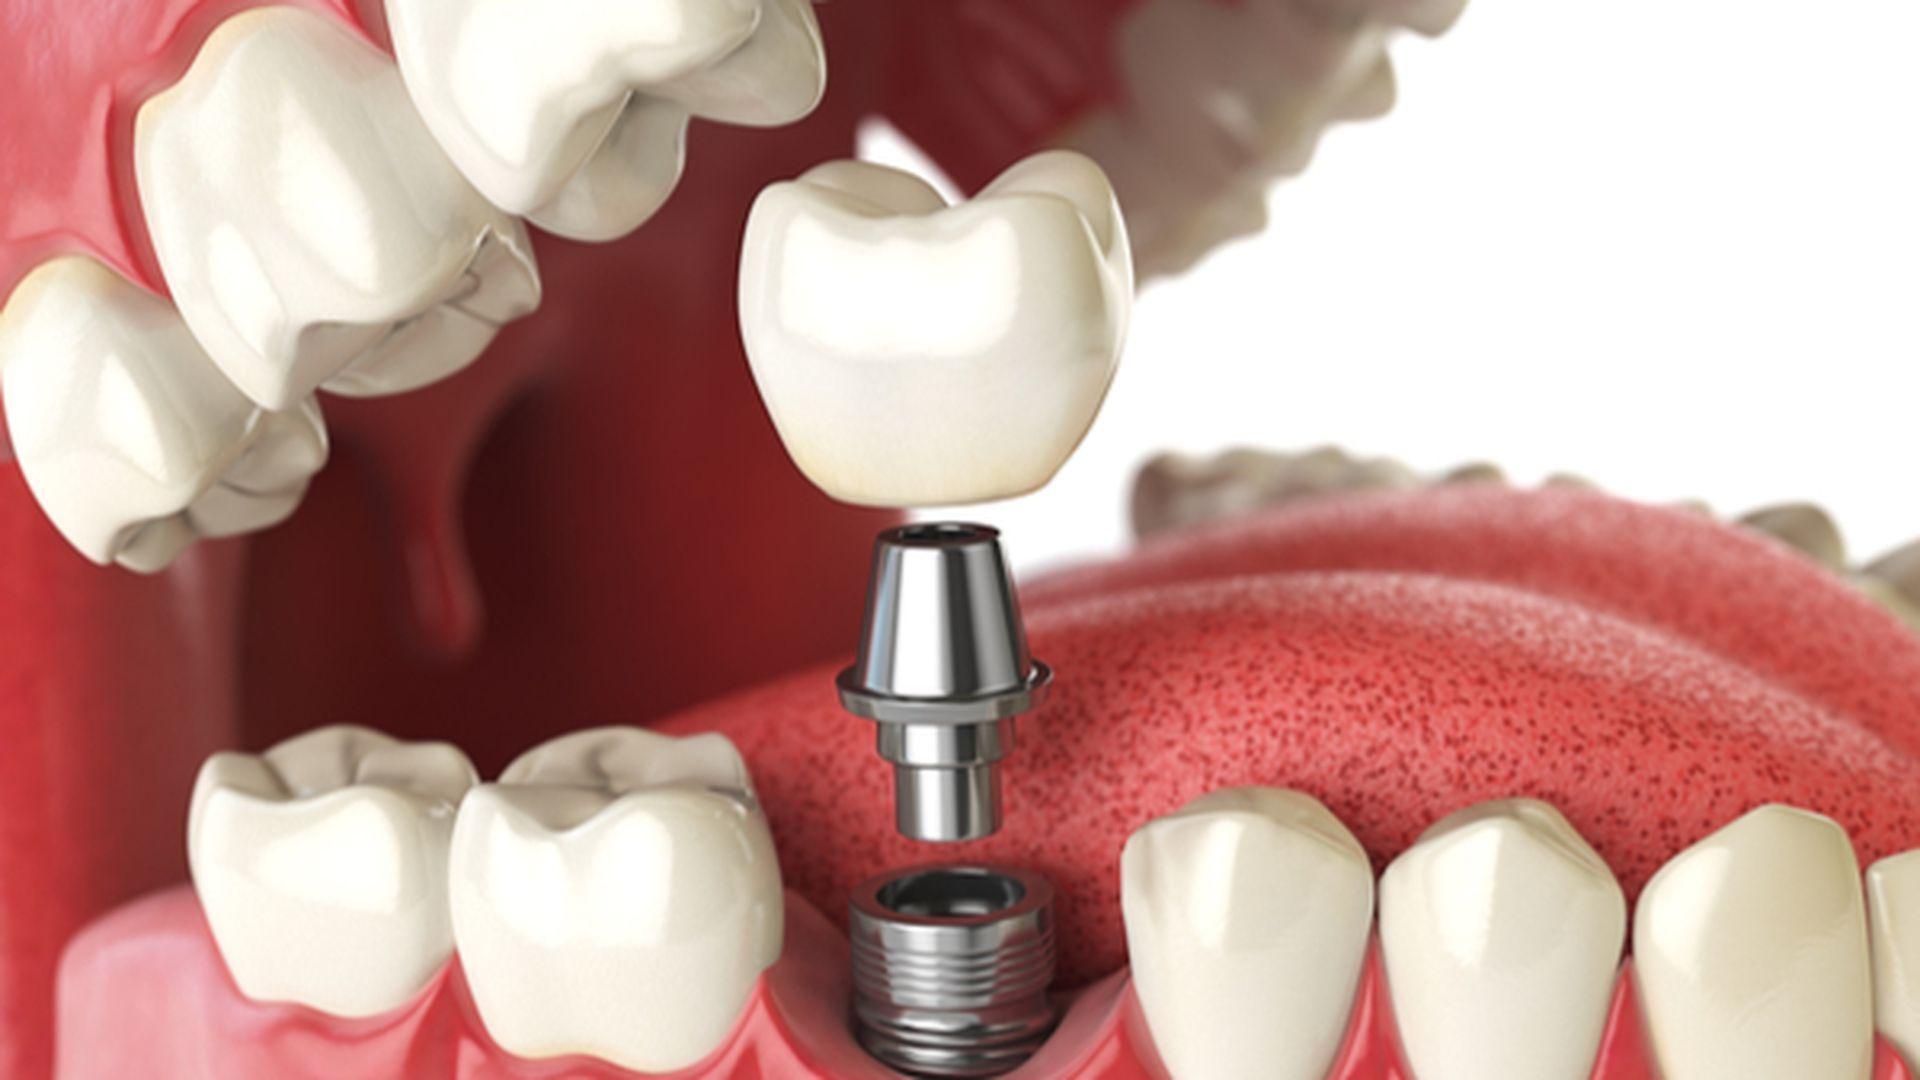 dental-implants-in-Erb-St-Erbsville-Dental-Waterloo-Dentist-1